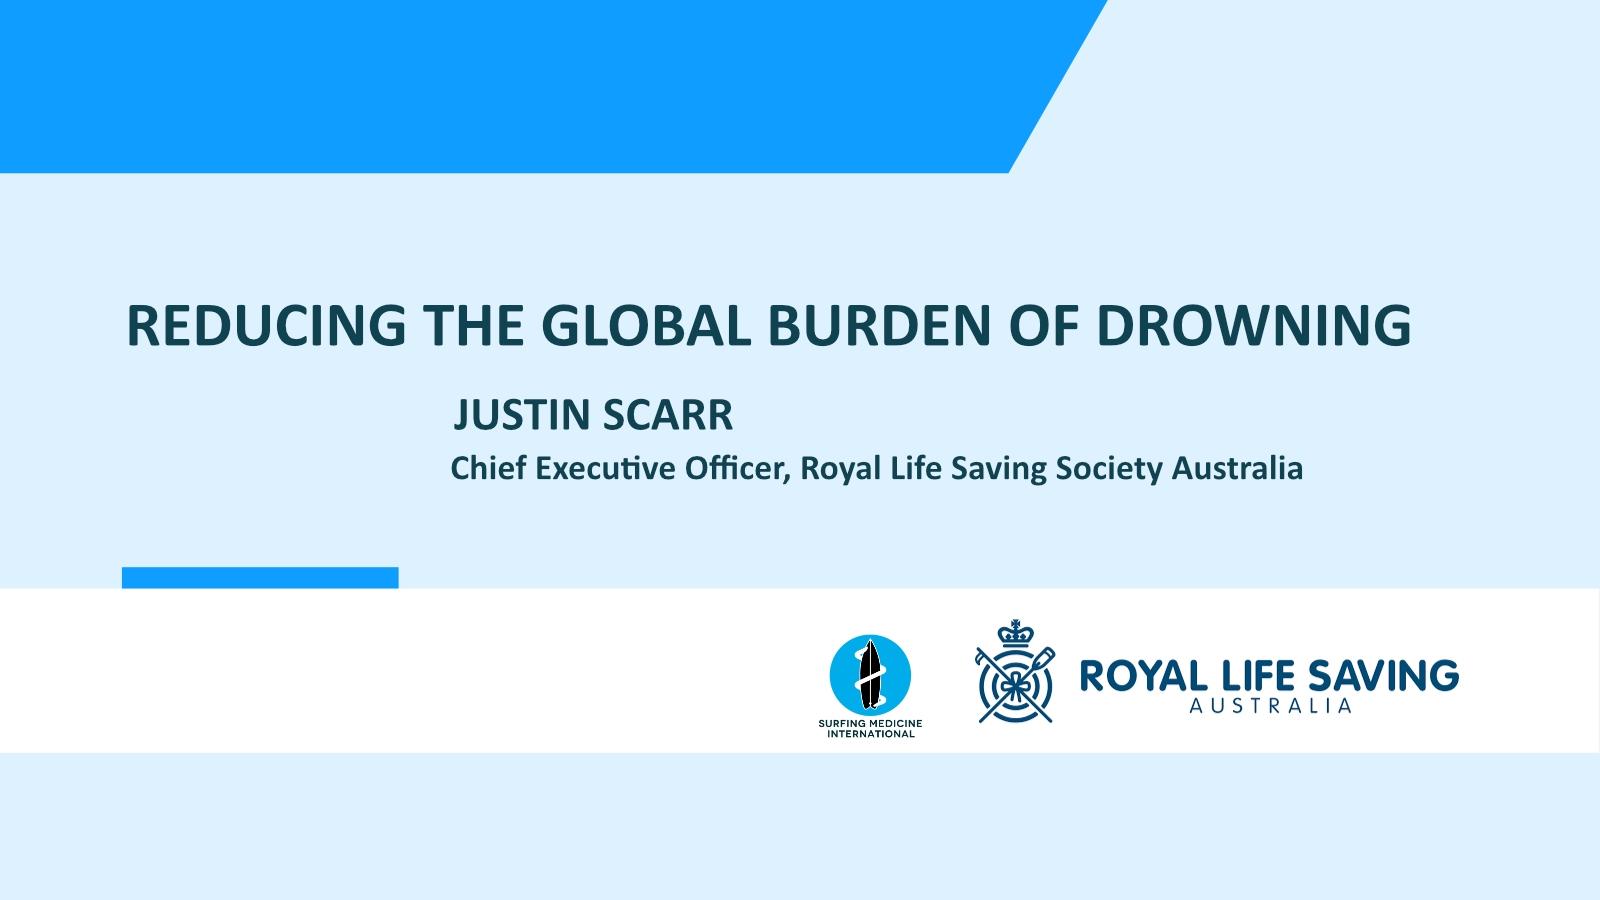 Global Burden of Drowning